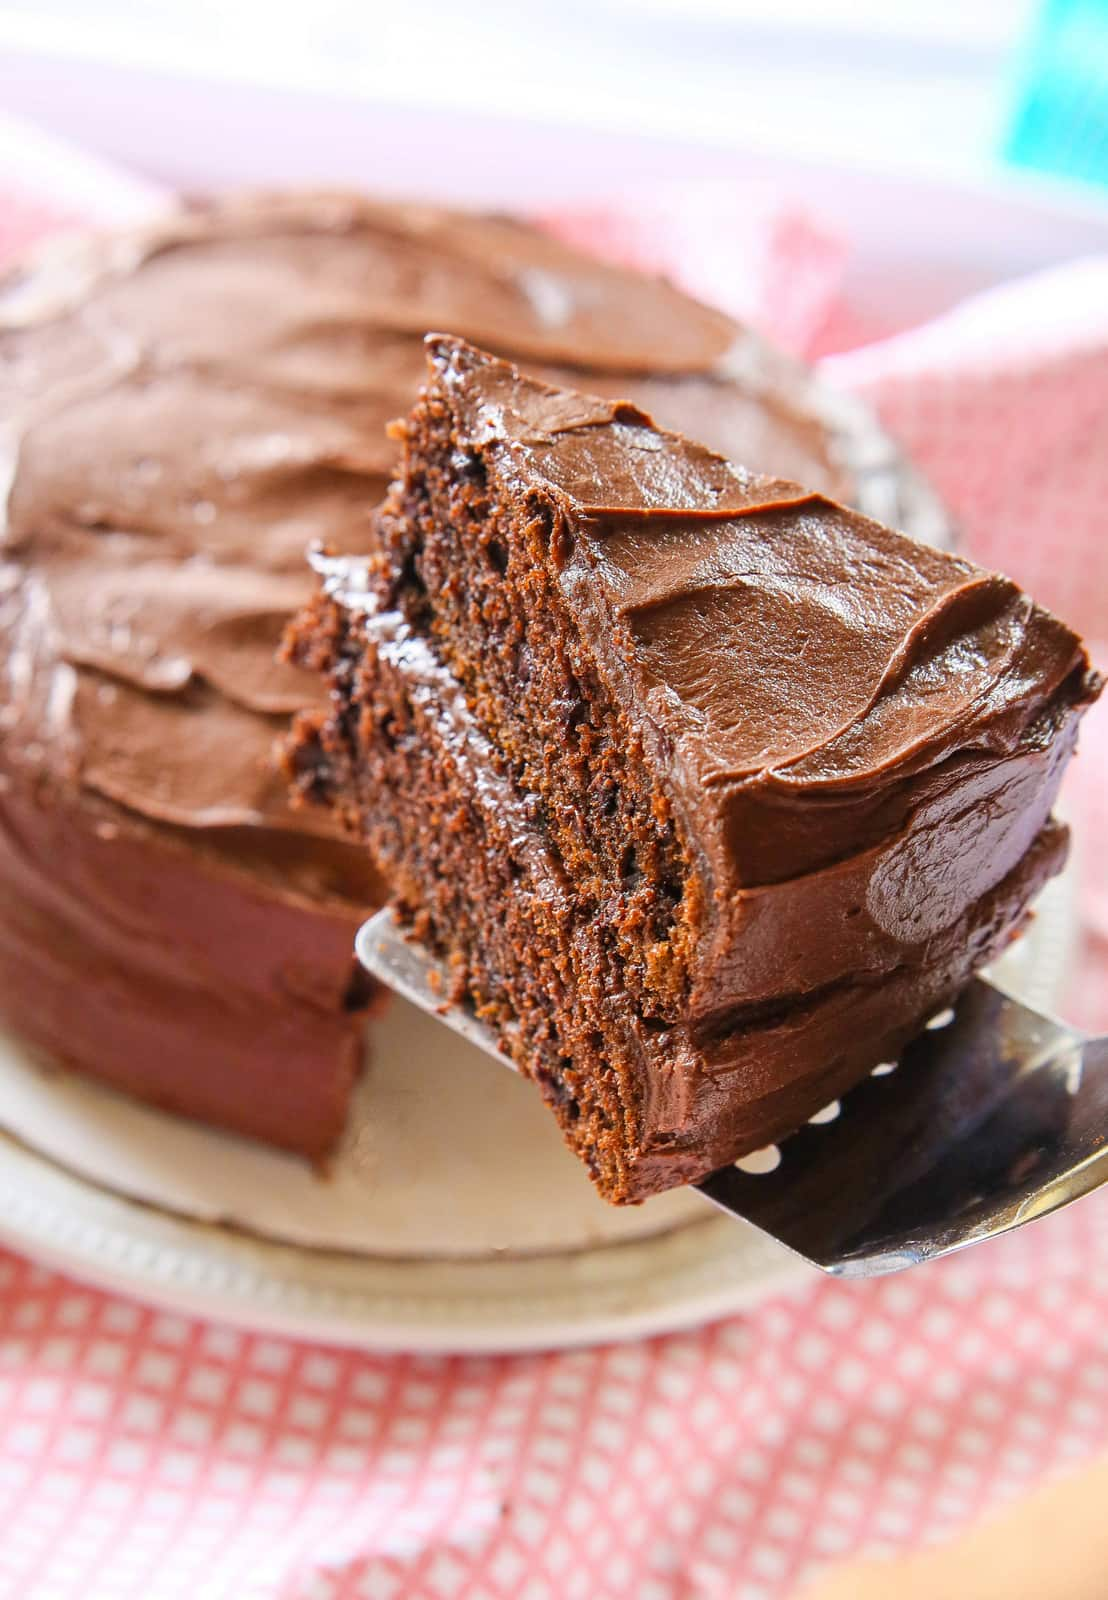 Hersheys Perfectly Chocolate Cake